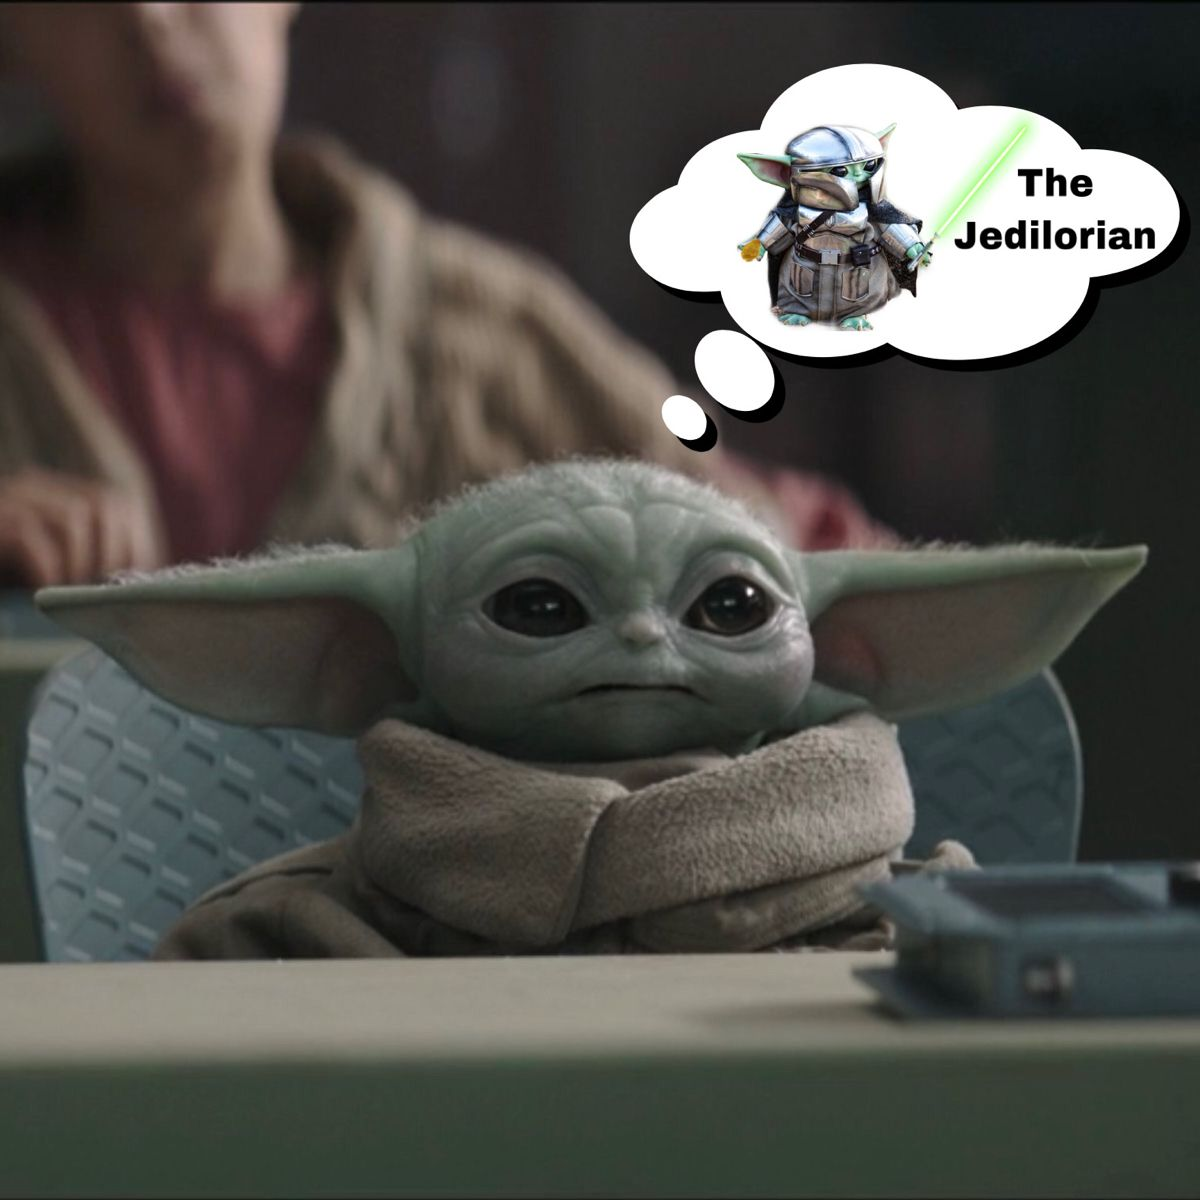 Pin By Stacey Herpel On Baby Yoda Star Wars Memes Yoda Meme Star Wars Fandom